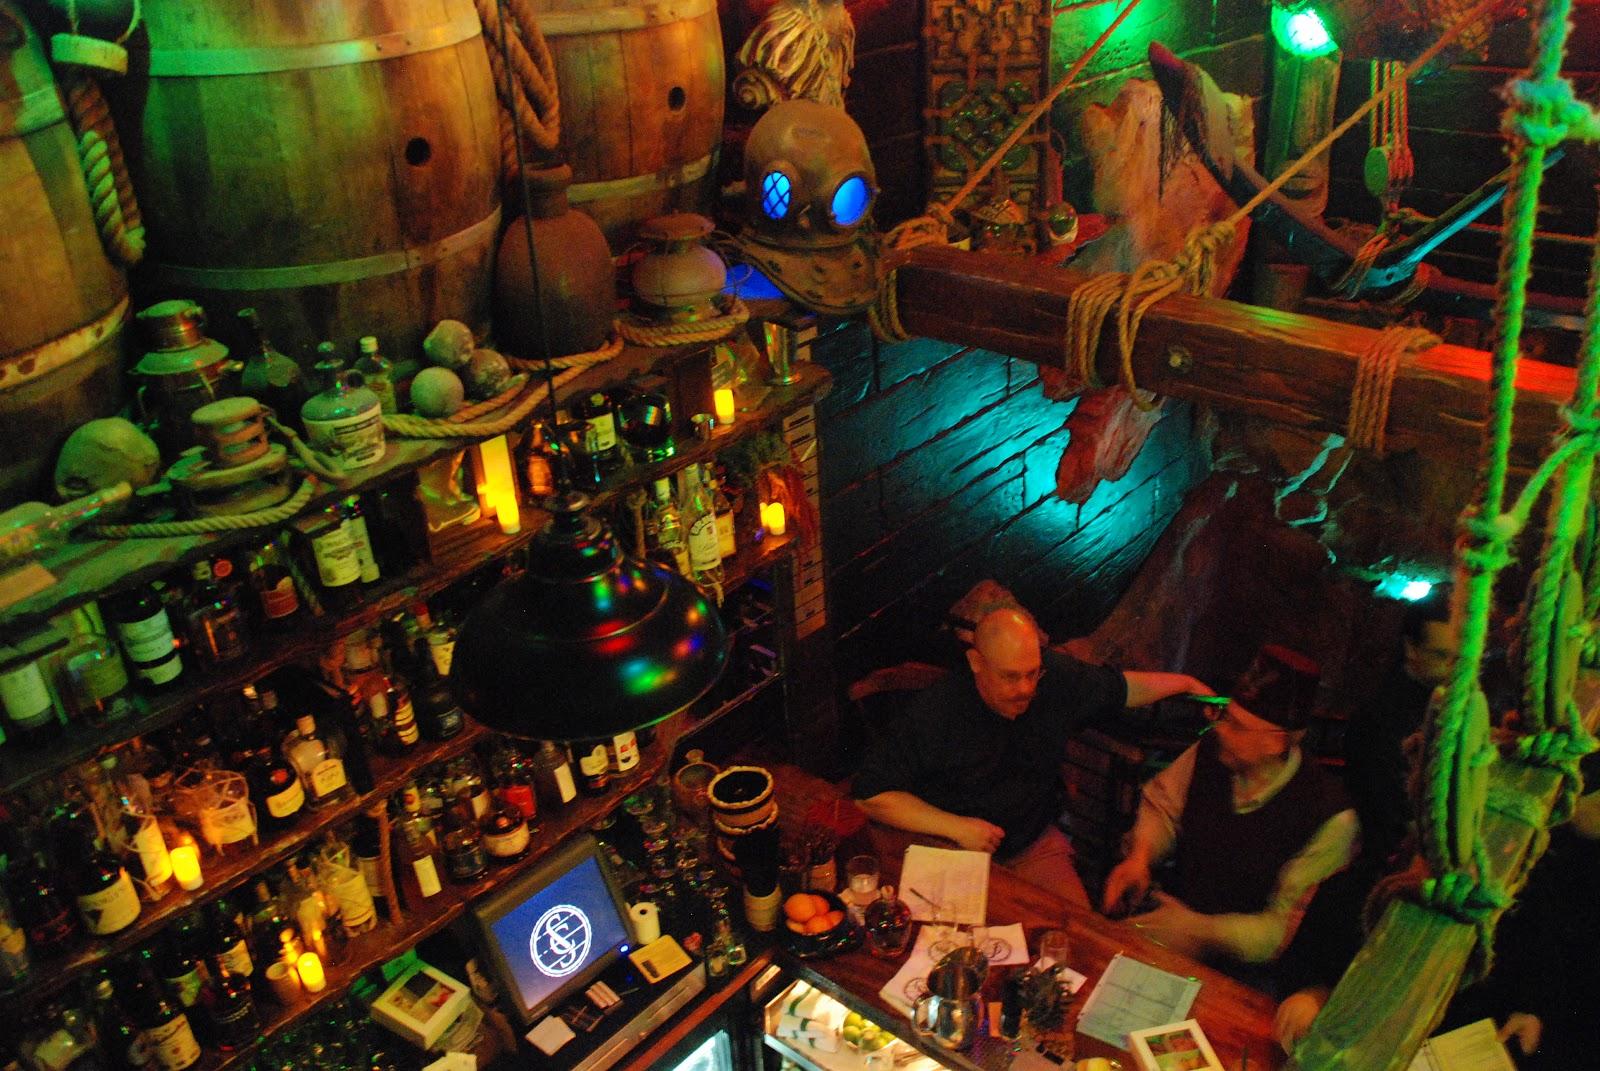 Smuggler Cove Rum Bar Smuggler 39 s Cove Bar